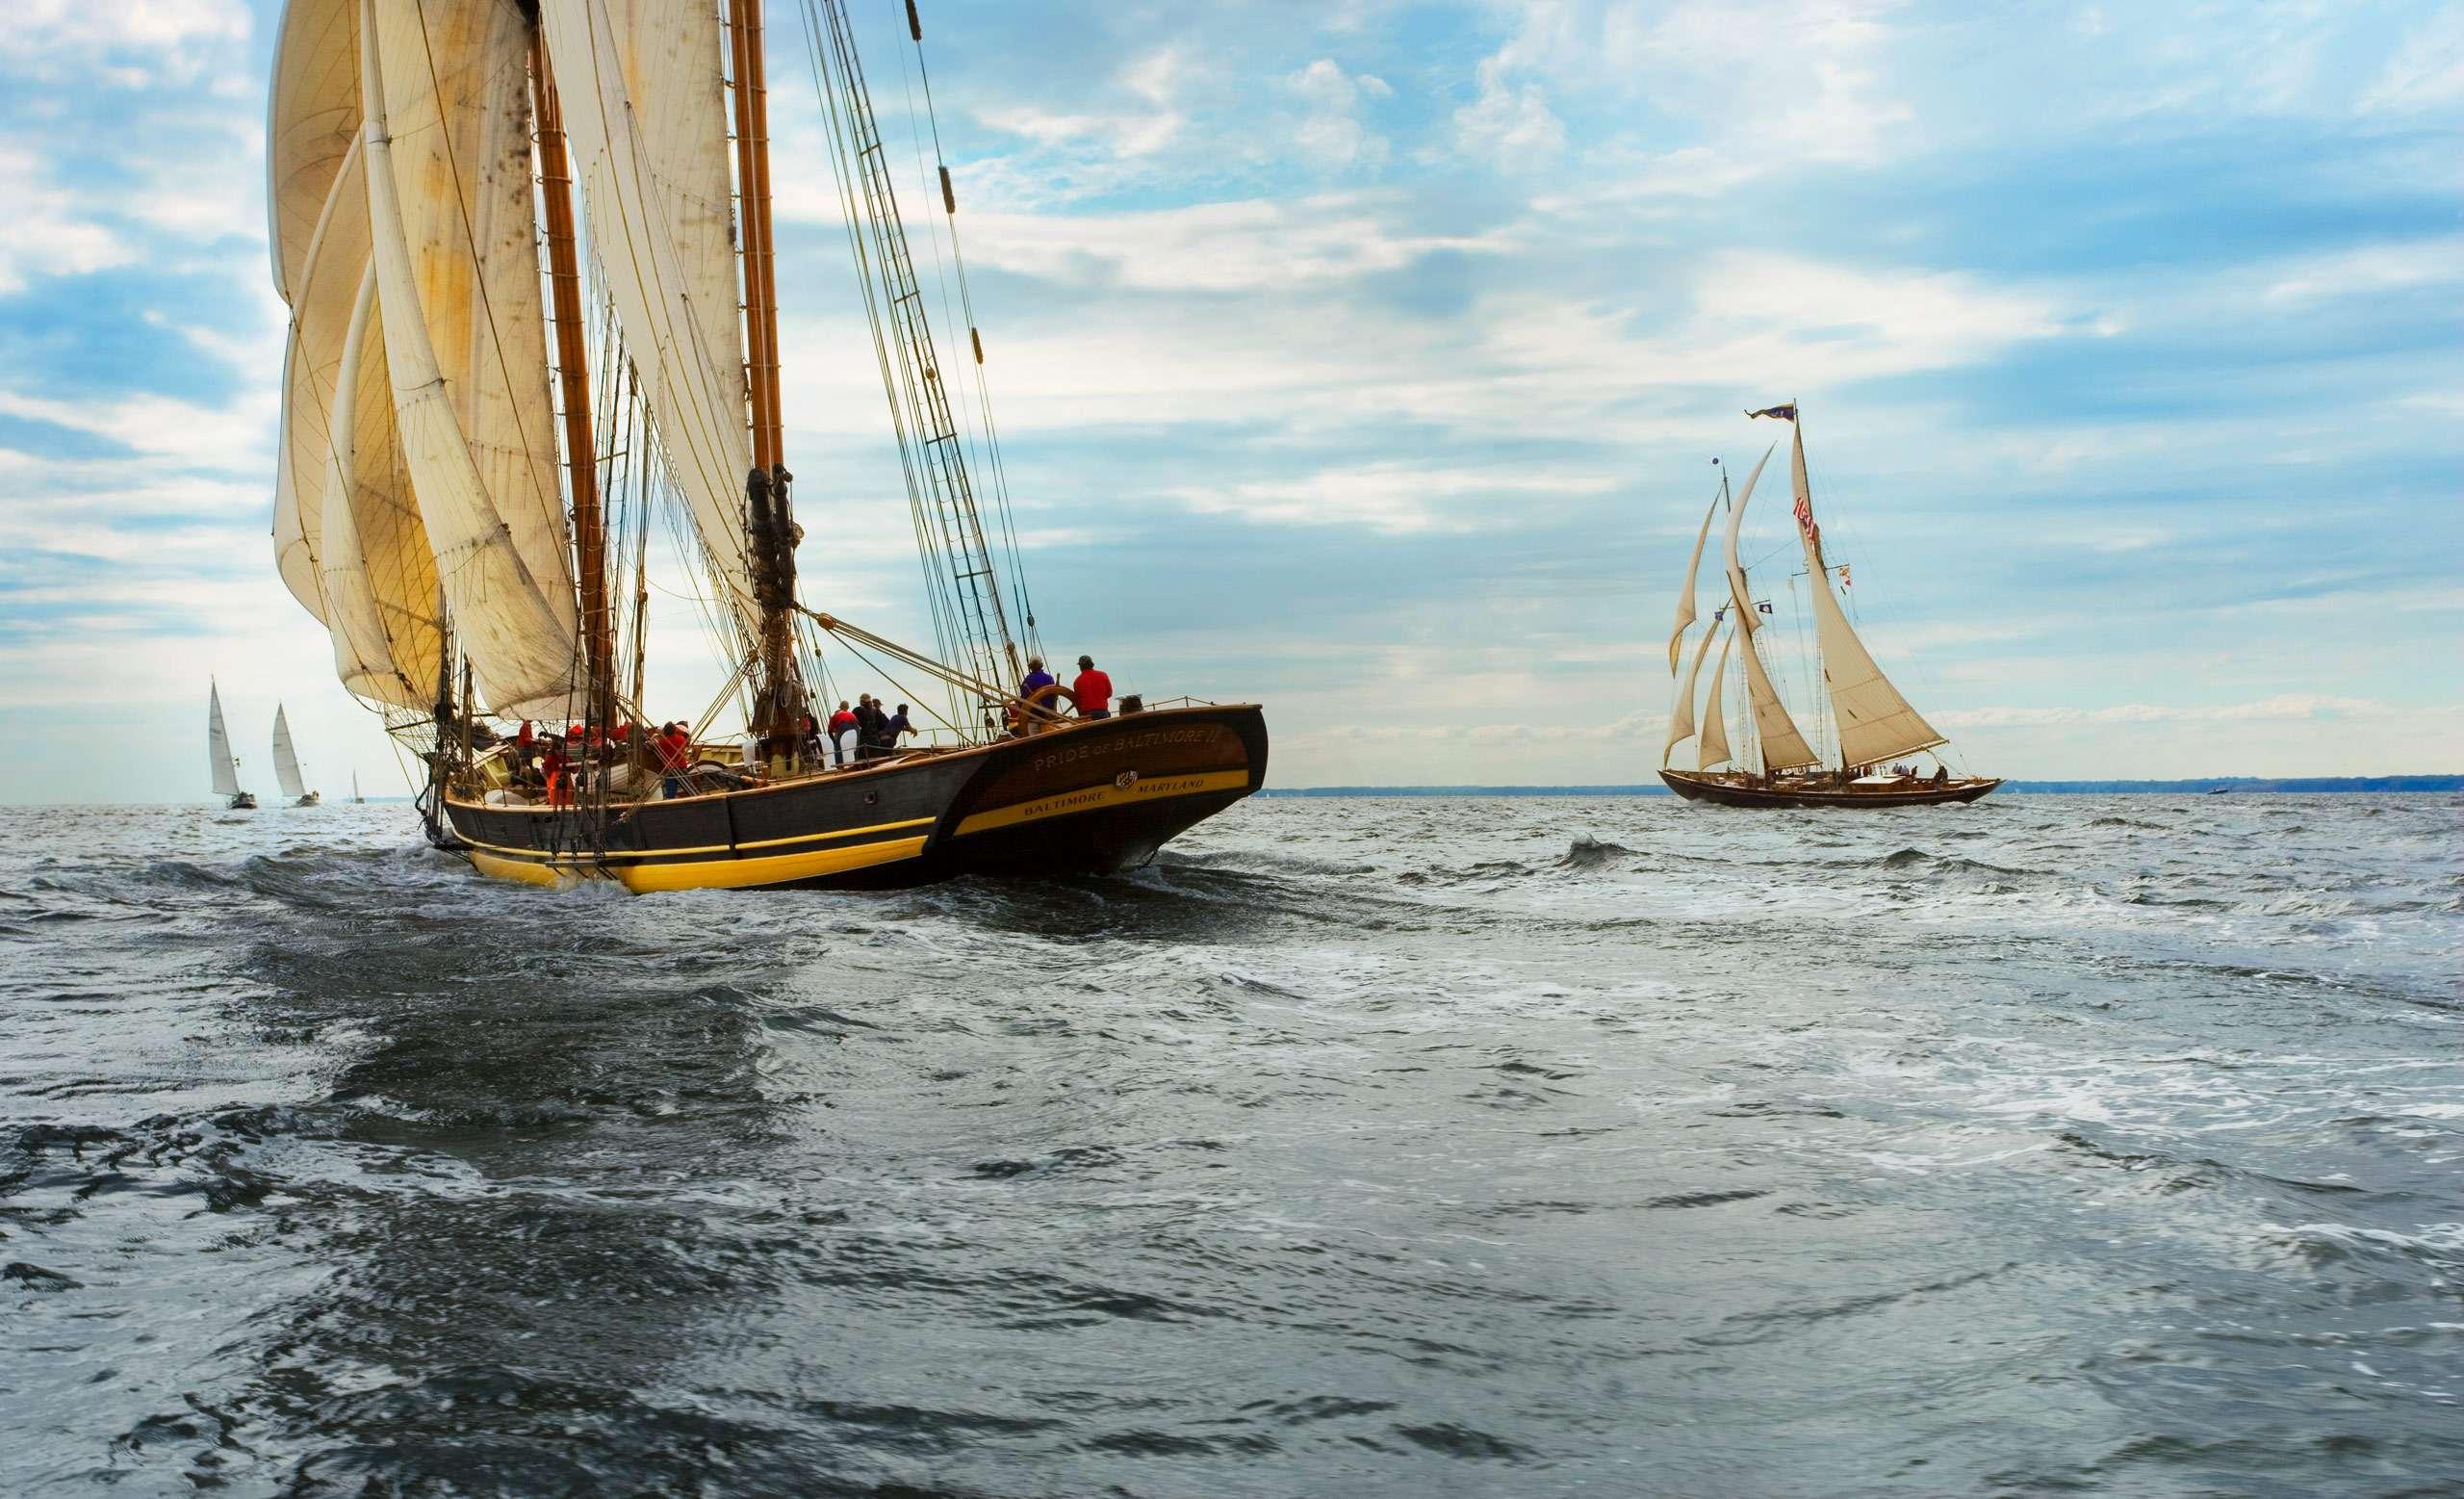 PORTFOLIO - Sailing - Tall Ships #10-PCG268